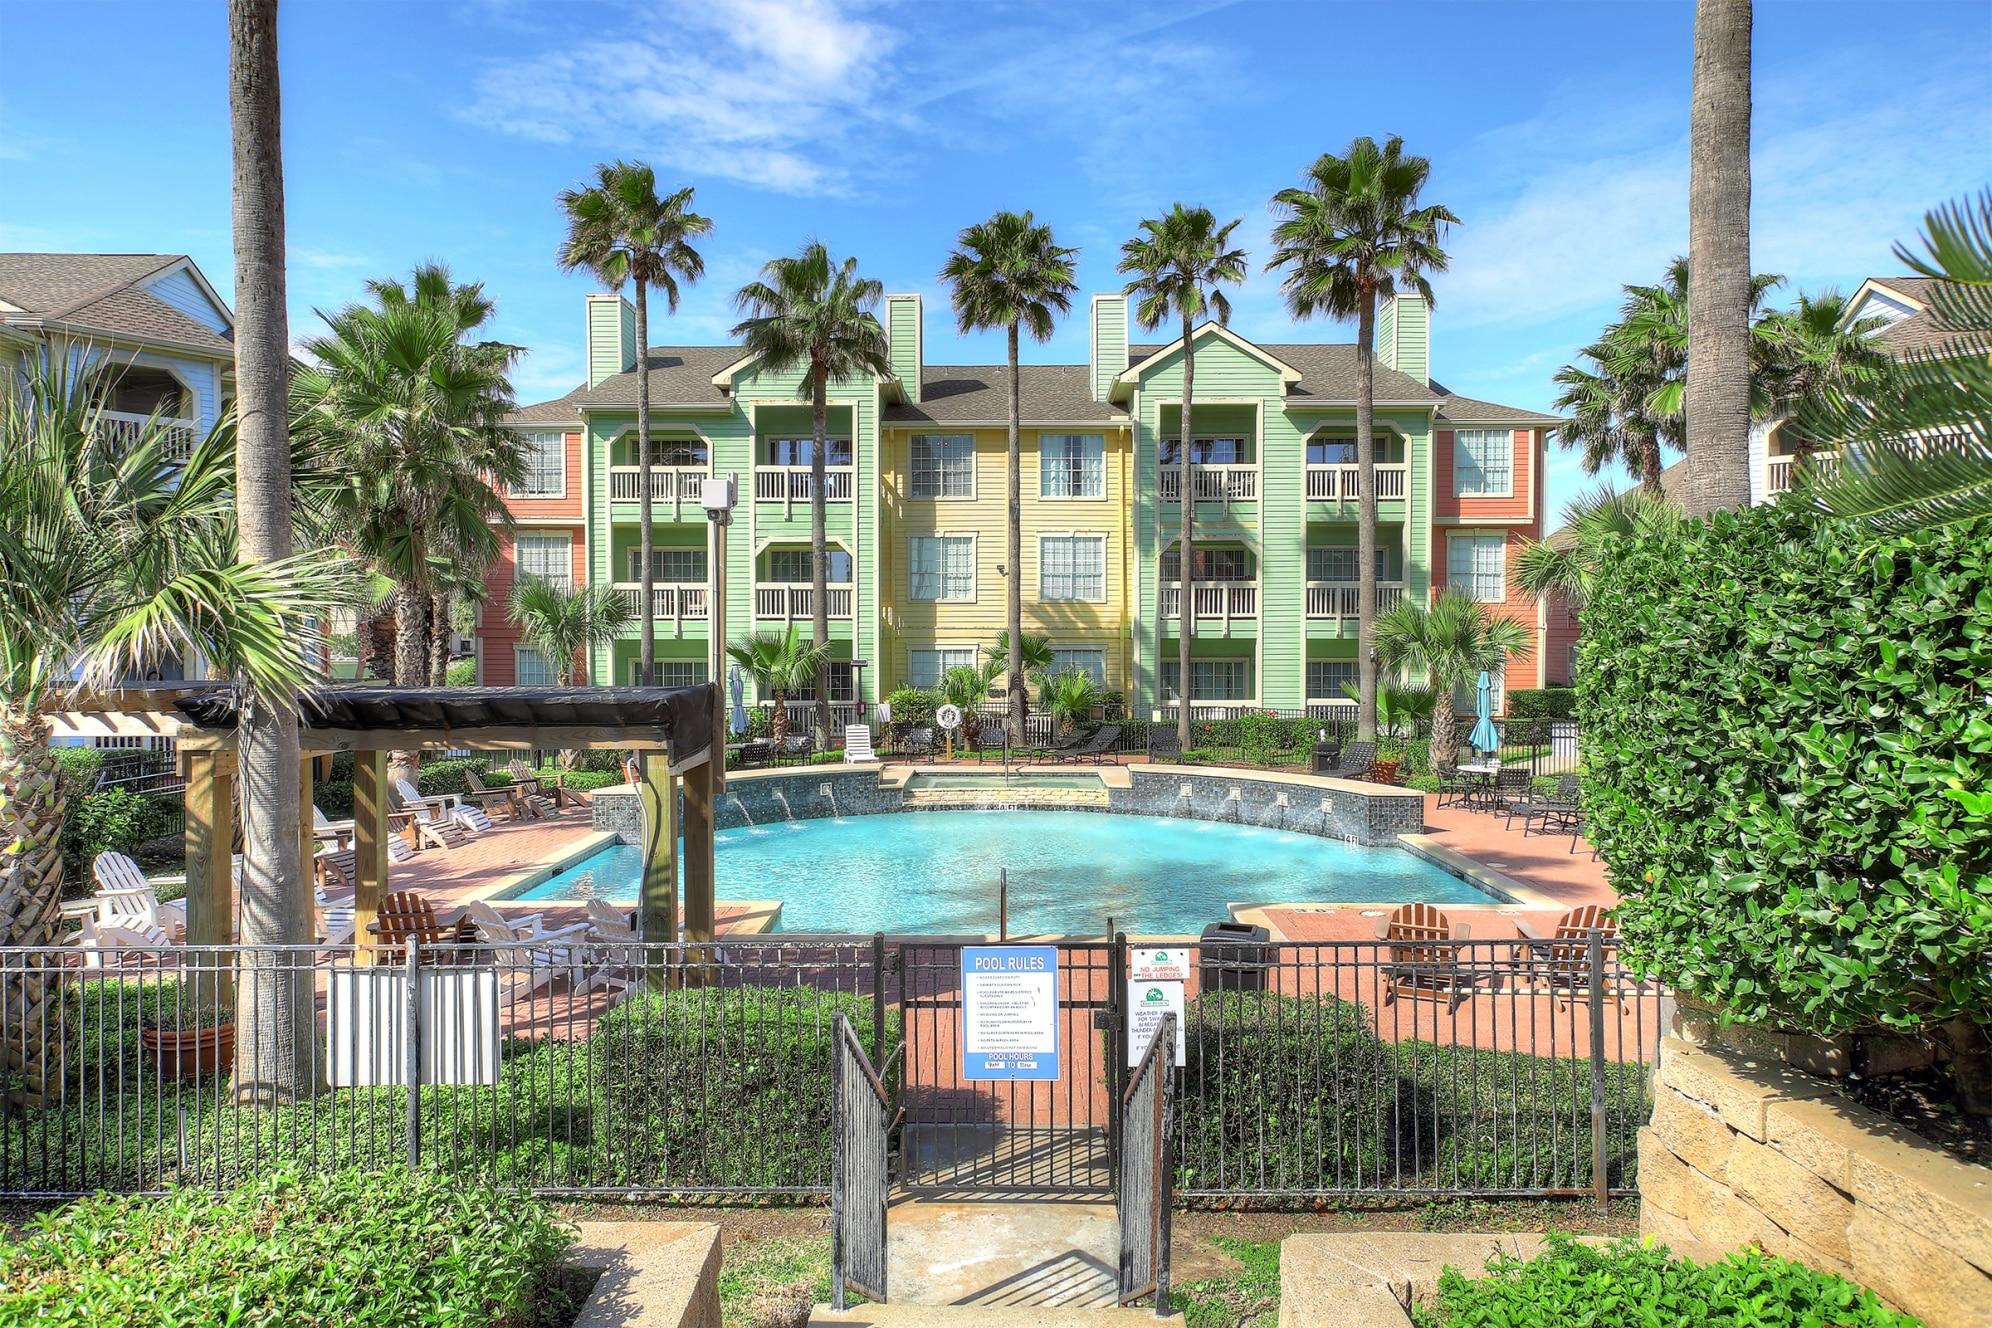 Dawn Condominiums Presented by The Galveston Condo Living Group